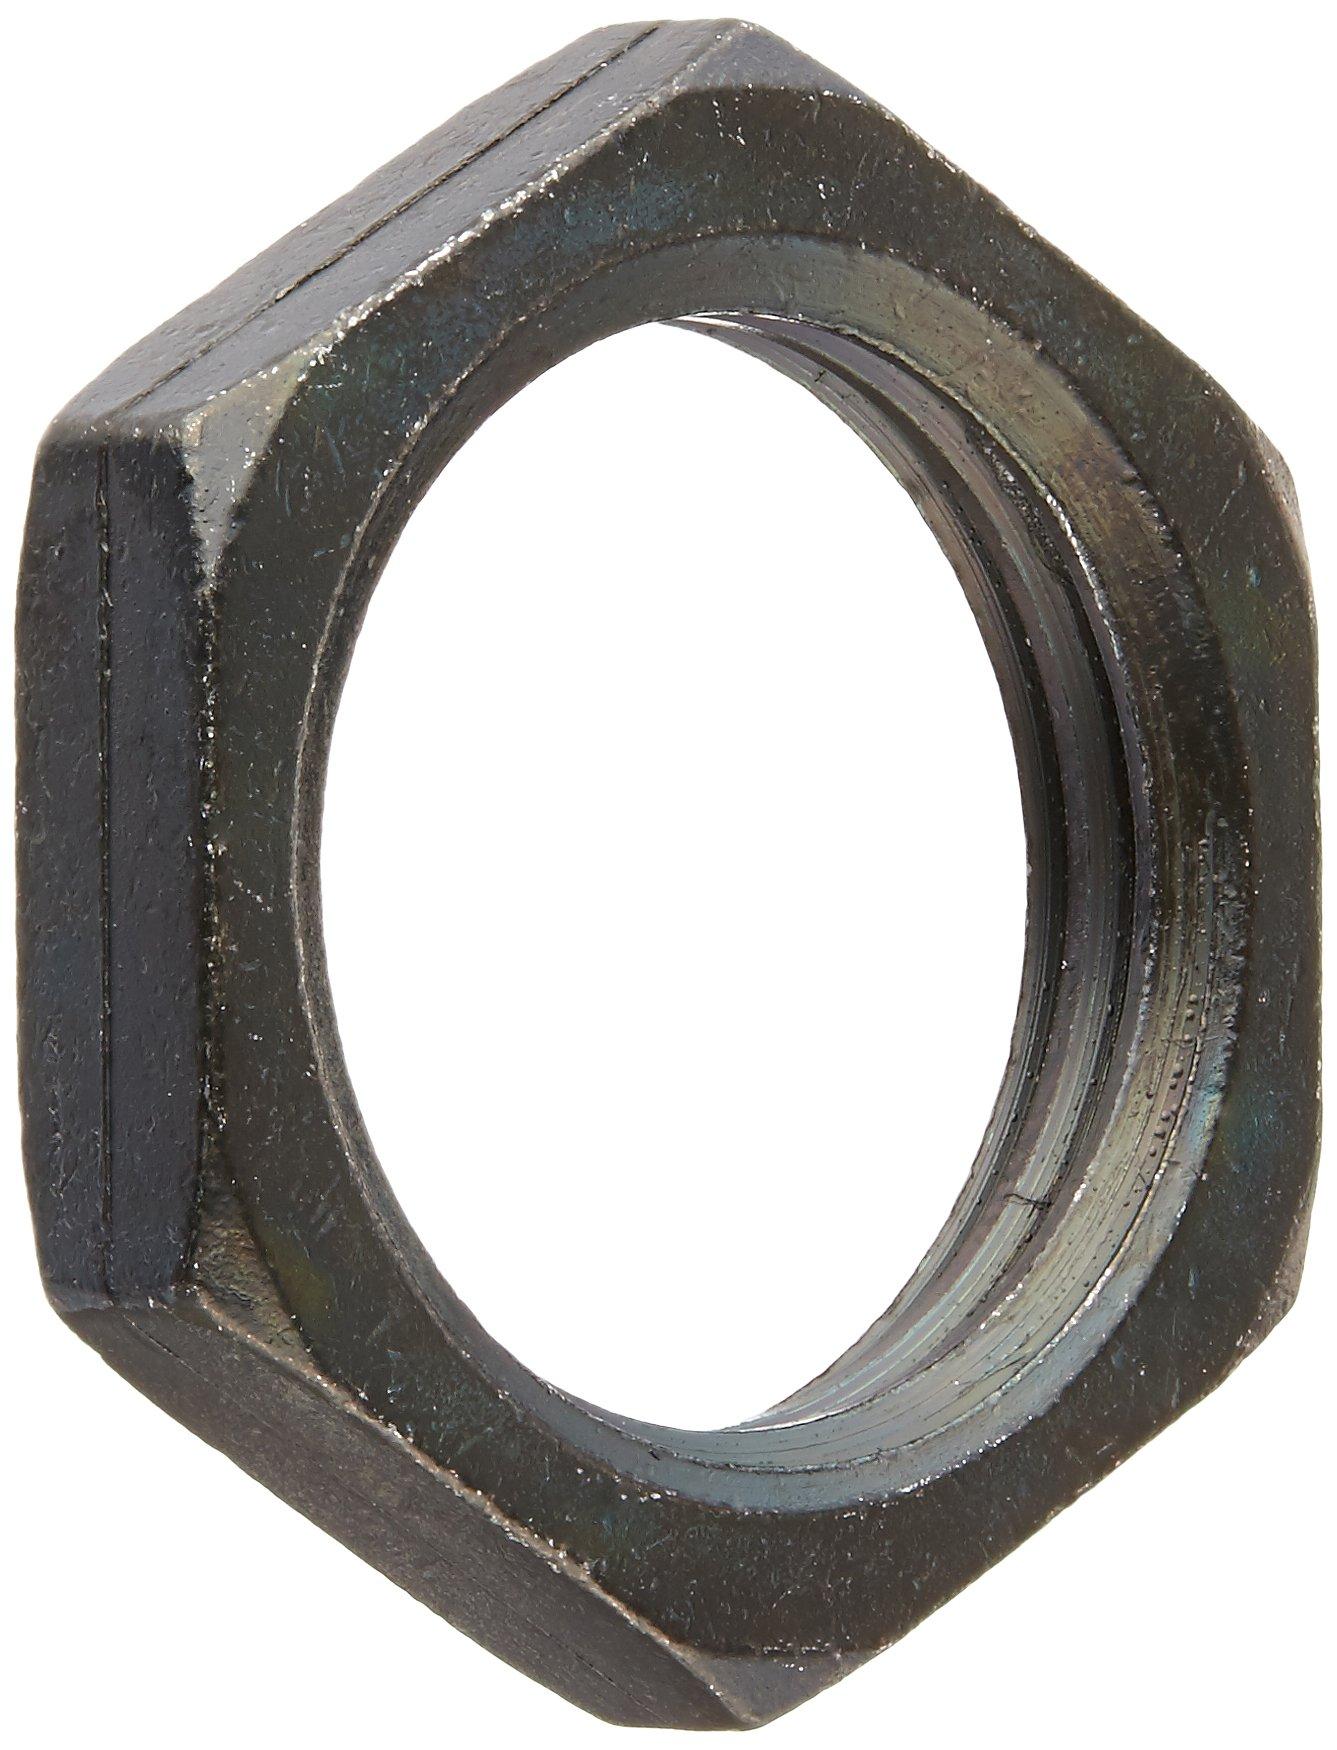 Parker 250-0400  Lock Nut For MC600, MA600, MVC600, SC650, MA900, MVC900, SC925